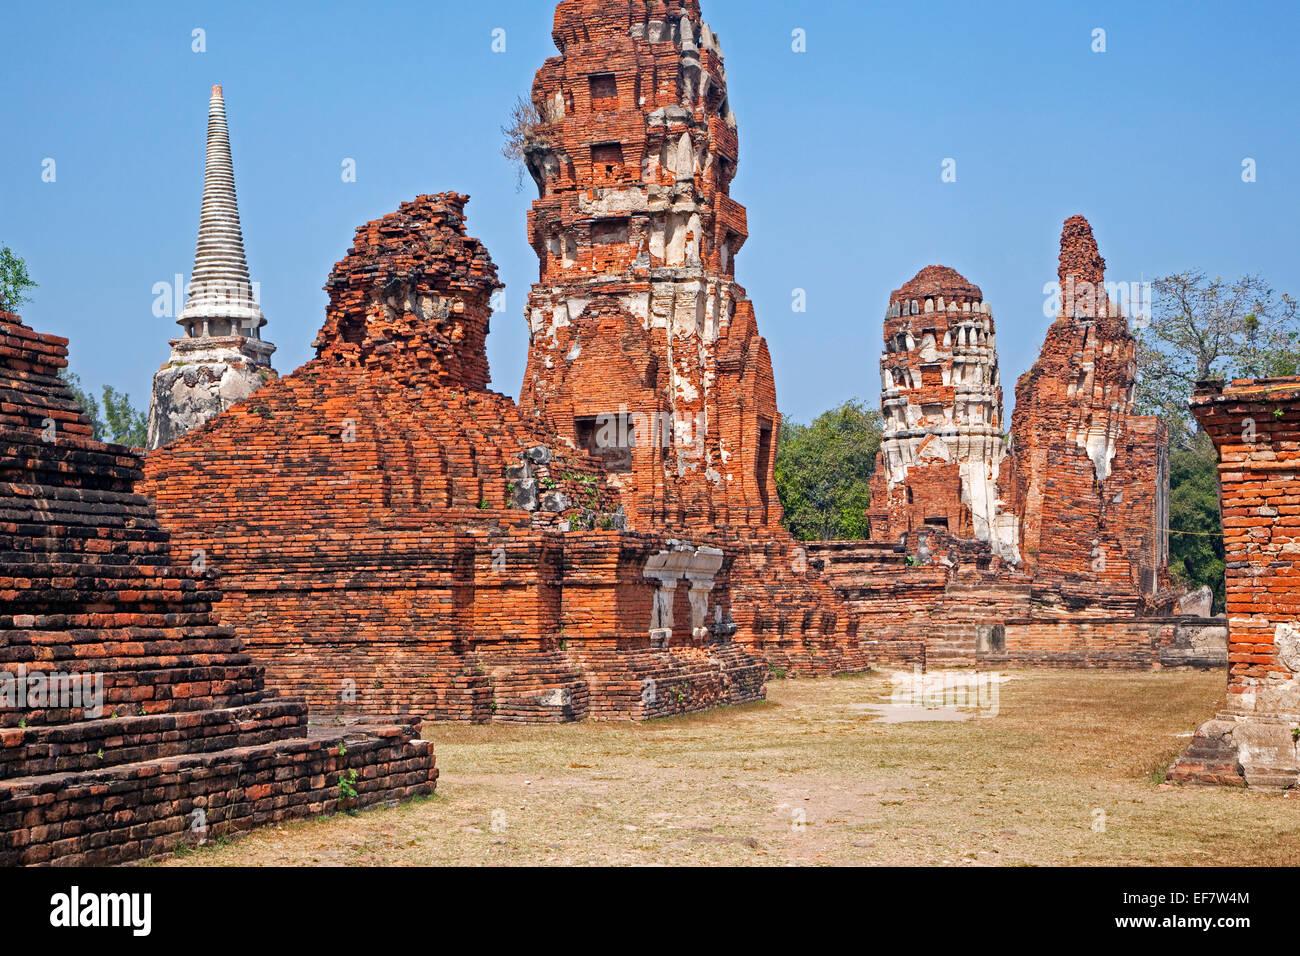 Ruined Buddhist stupas at Wat Mahathat in the Ayutthaya Historical Park, Thailand - Stock Image